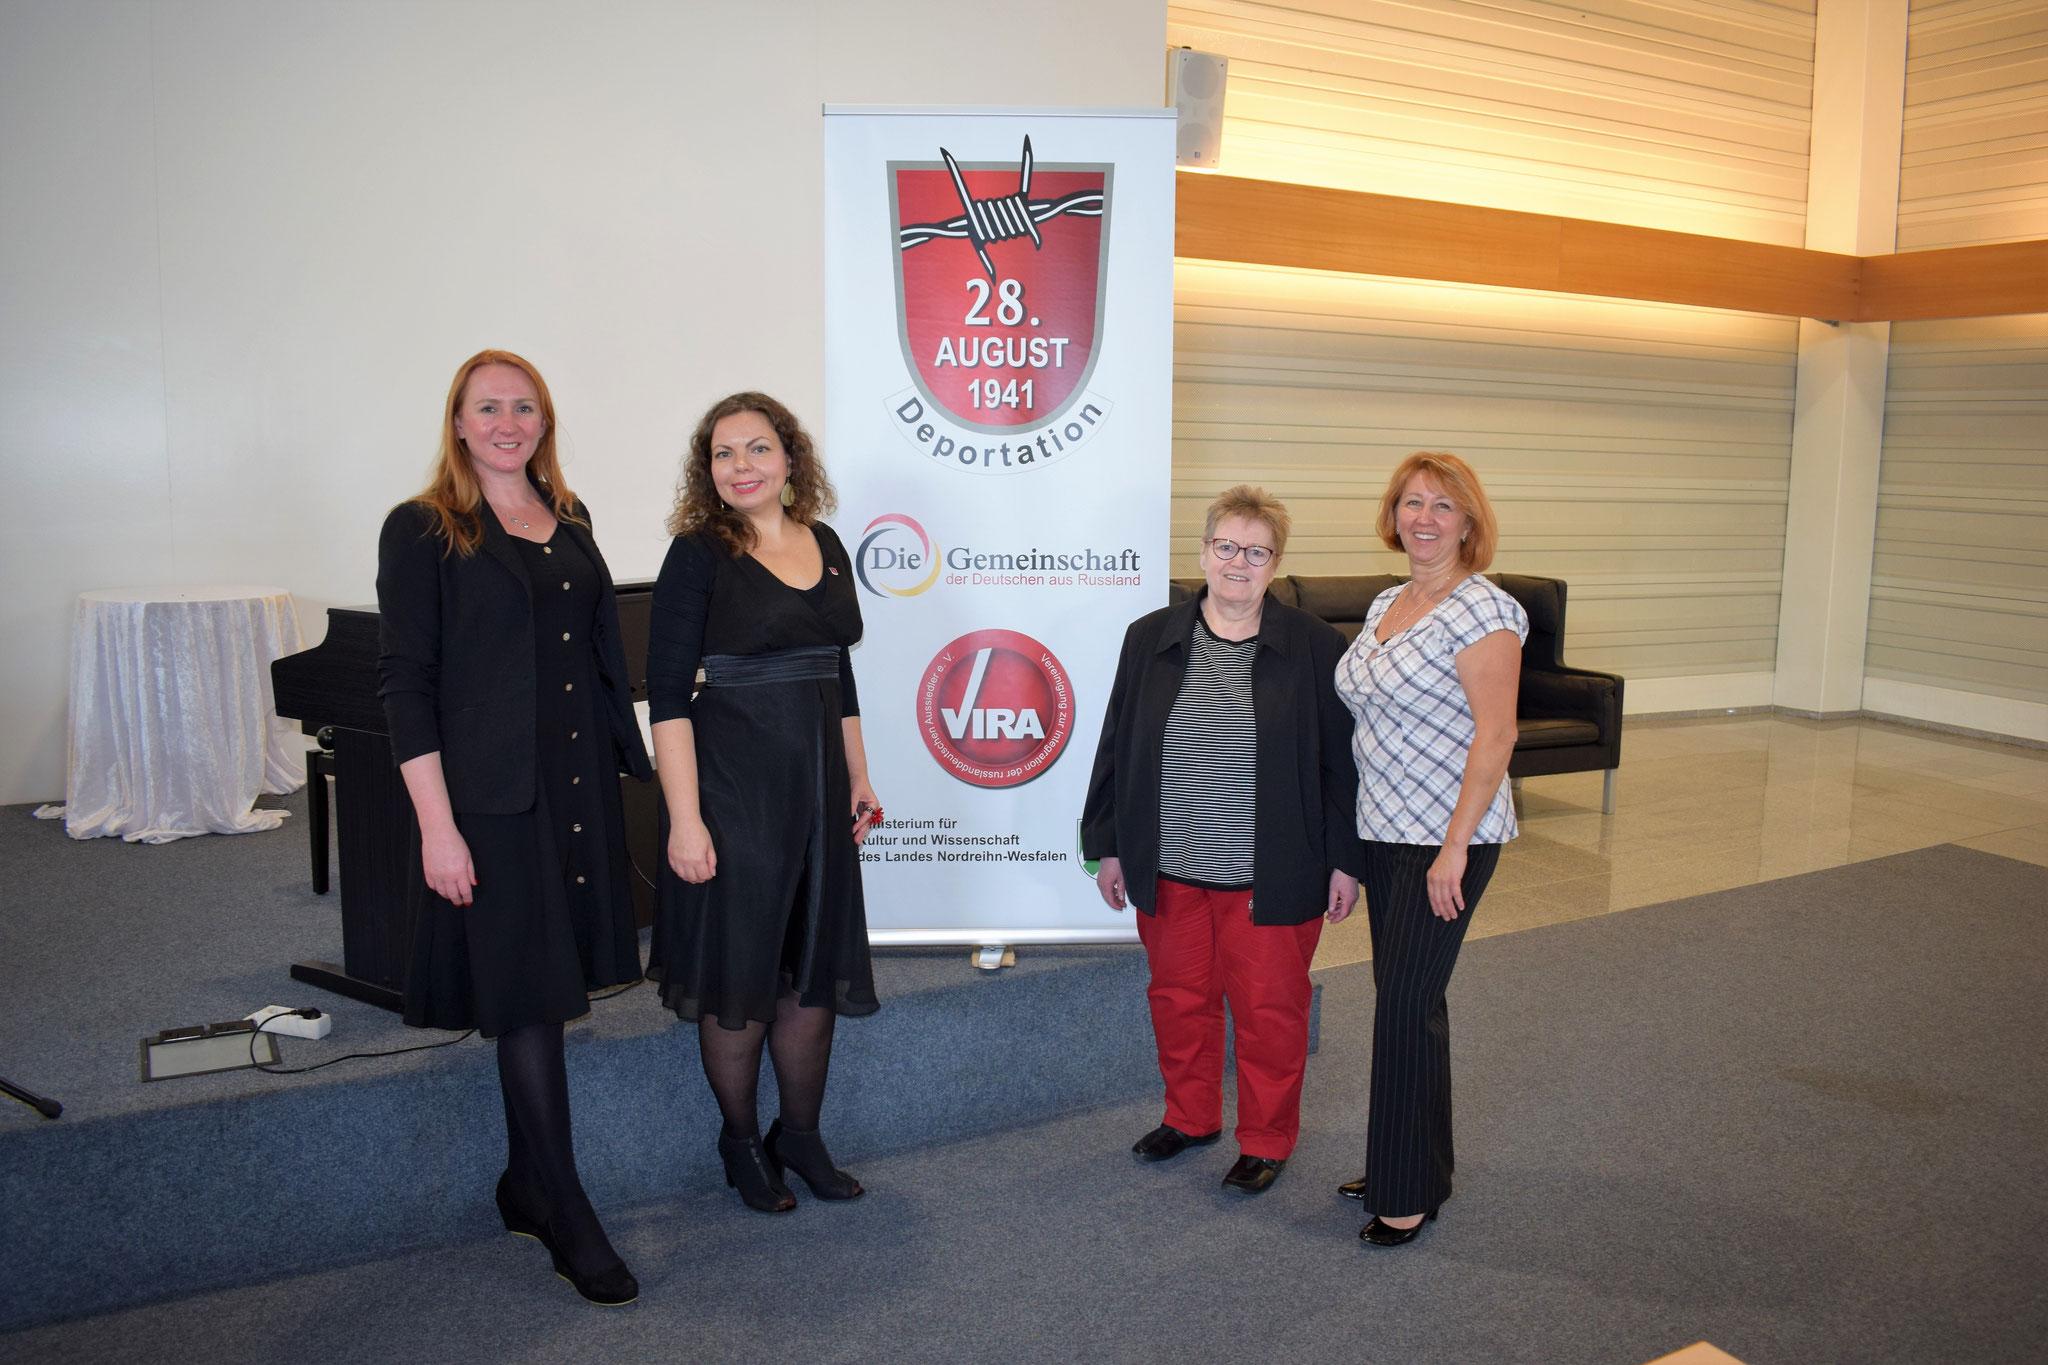 Katharina Martin-Virolainen, Ekaterina Grysiewicz, Rosa Ananitschev, Ludmila Esaulov